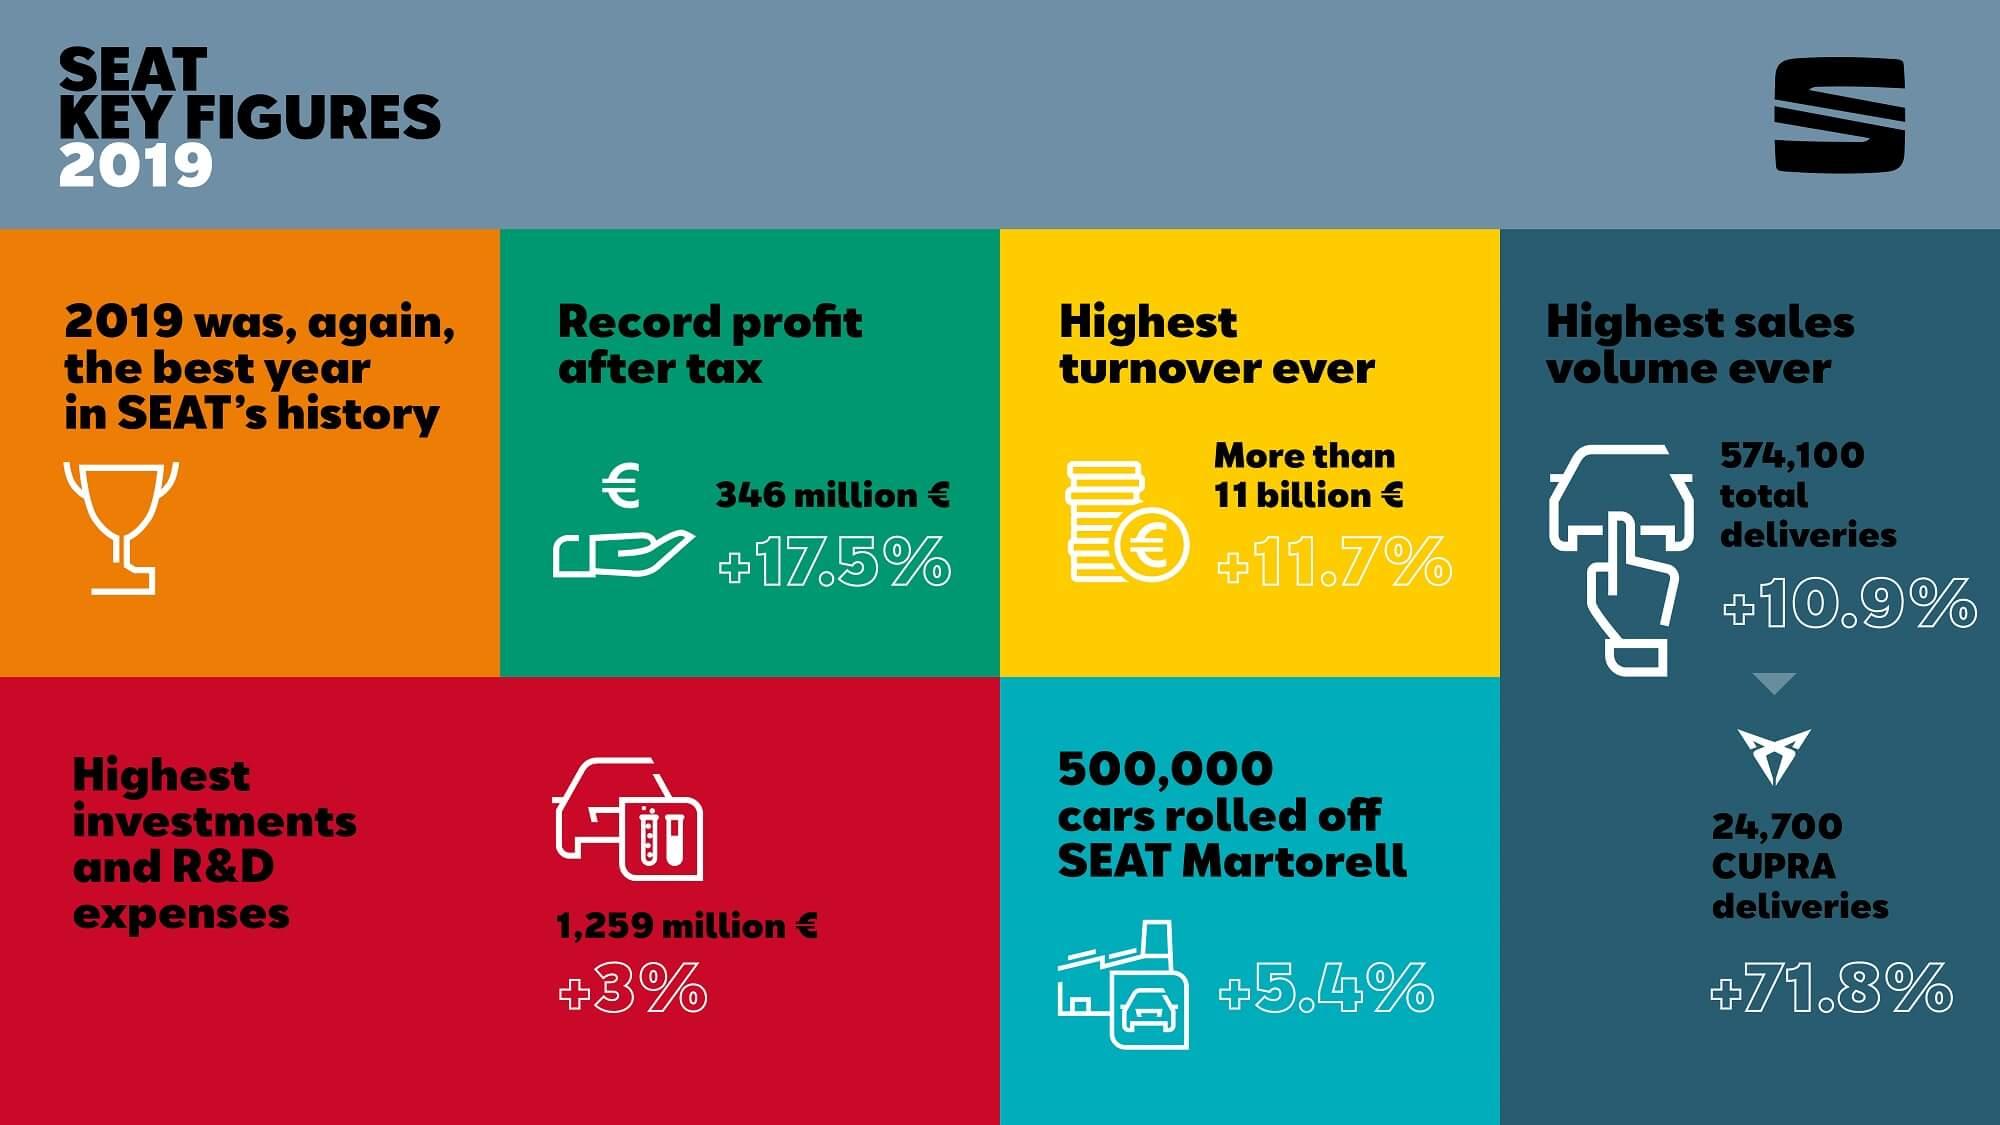 Resultados financeiros SEAT